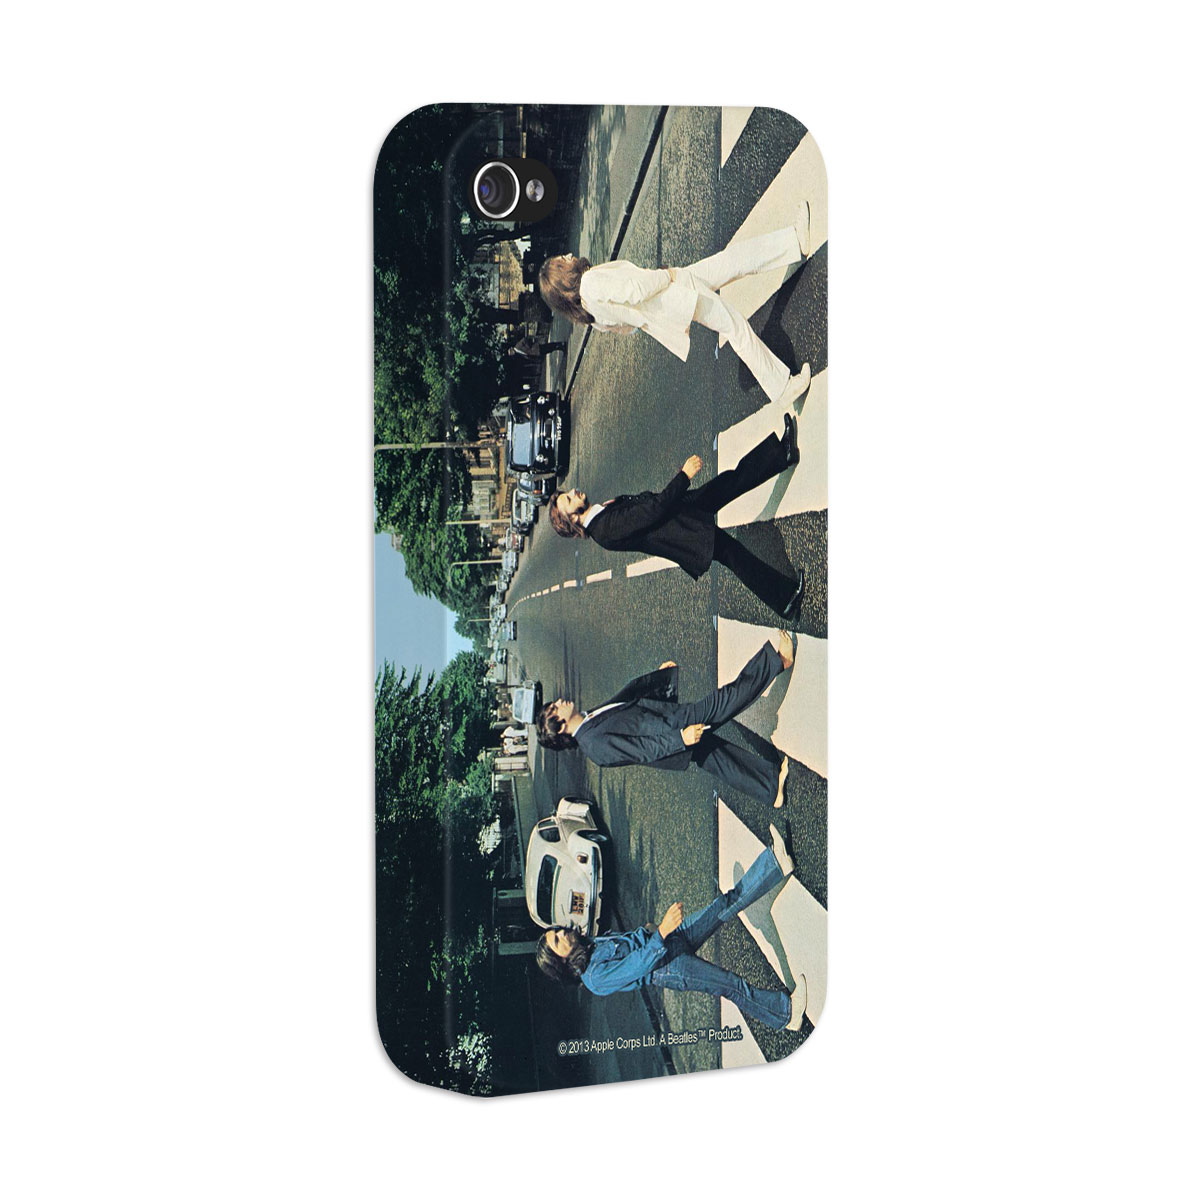 Capa de iPhone 4/4S The Beatles Abbey Road Original